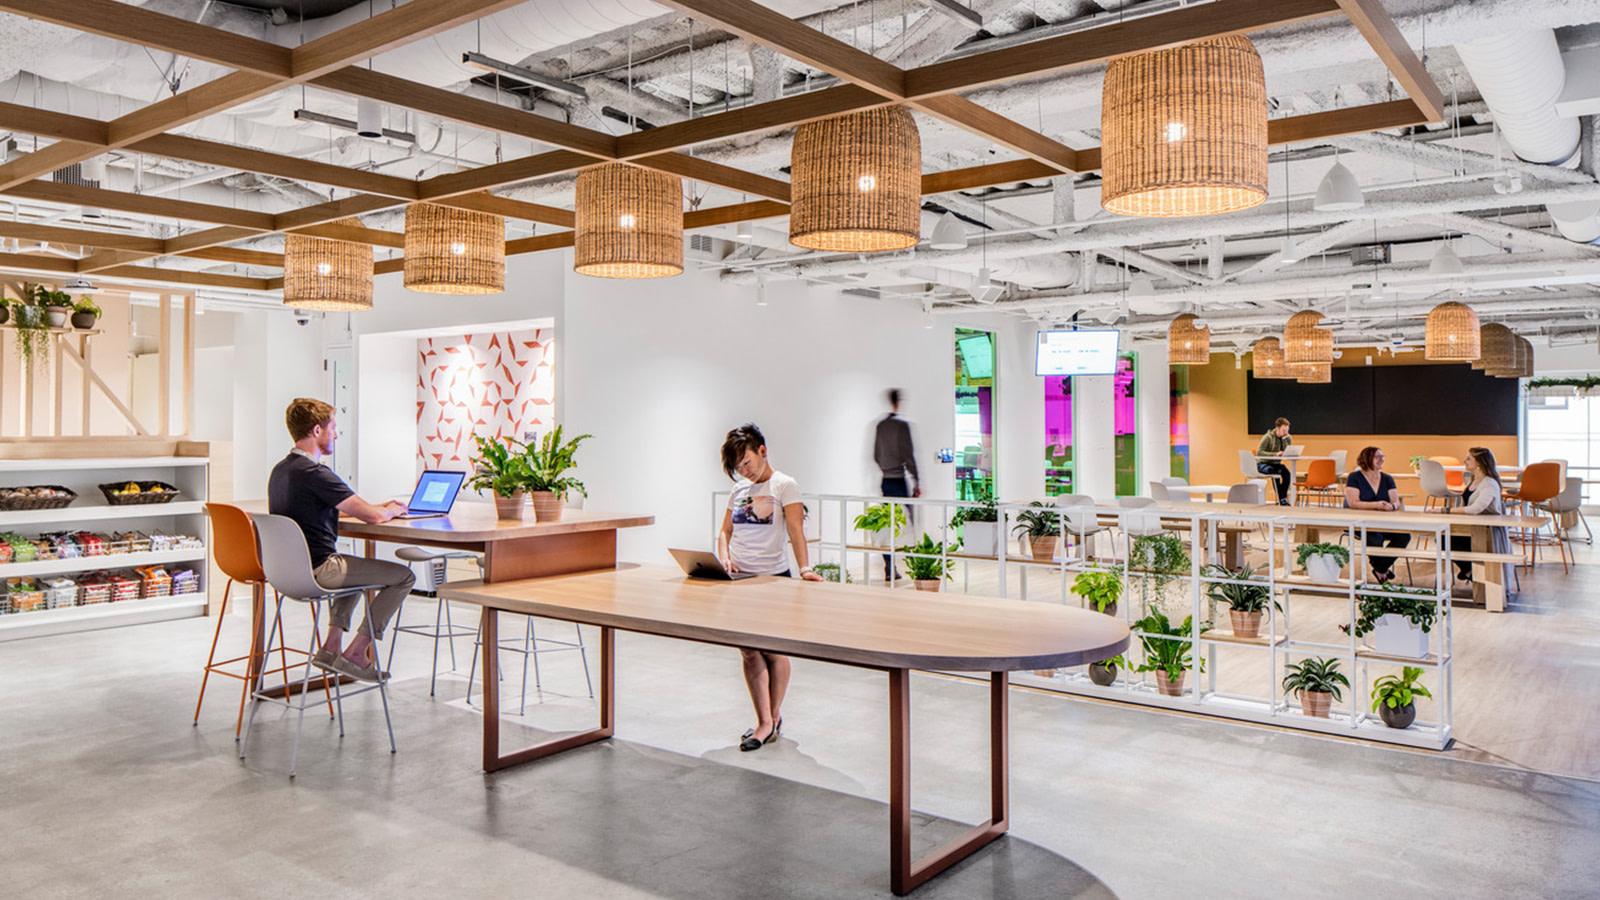 An alternative work space in San Francisco